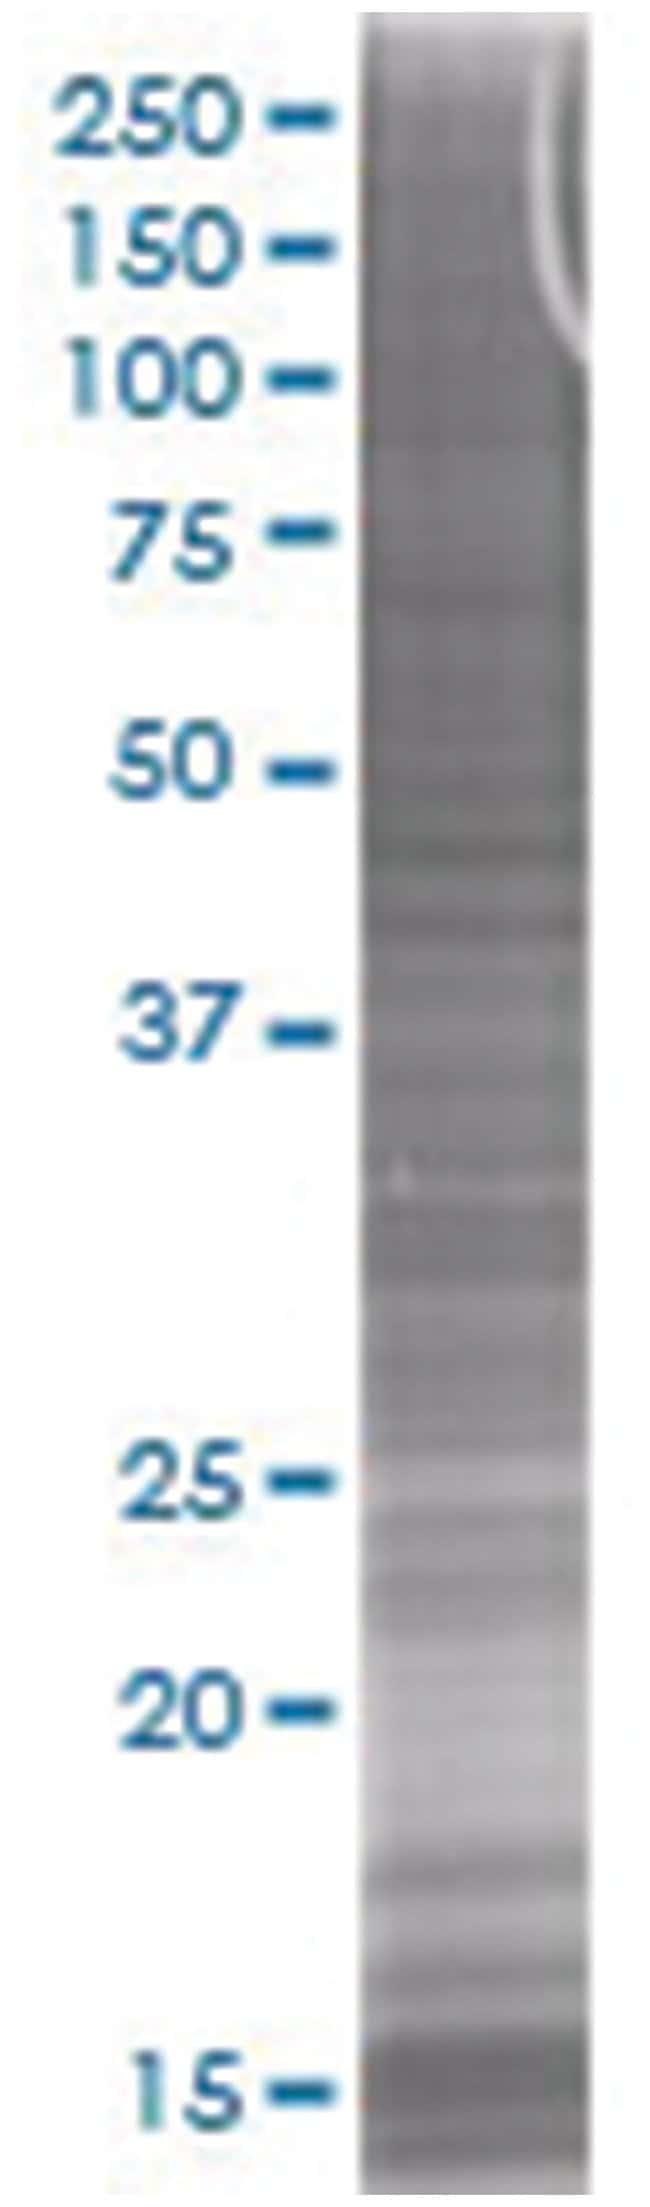 HMGA1 293T Cell Overexpression Lysate (Denatured), Abnova 100µL:Life